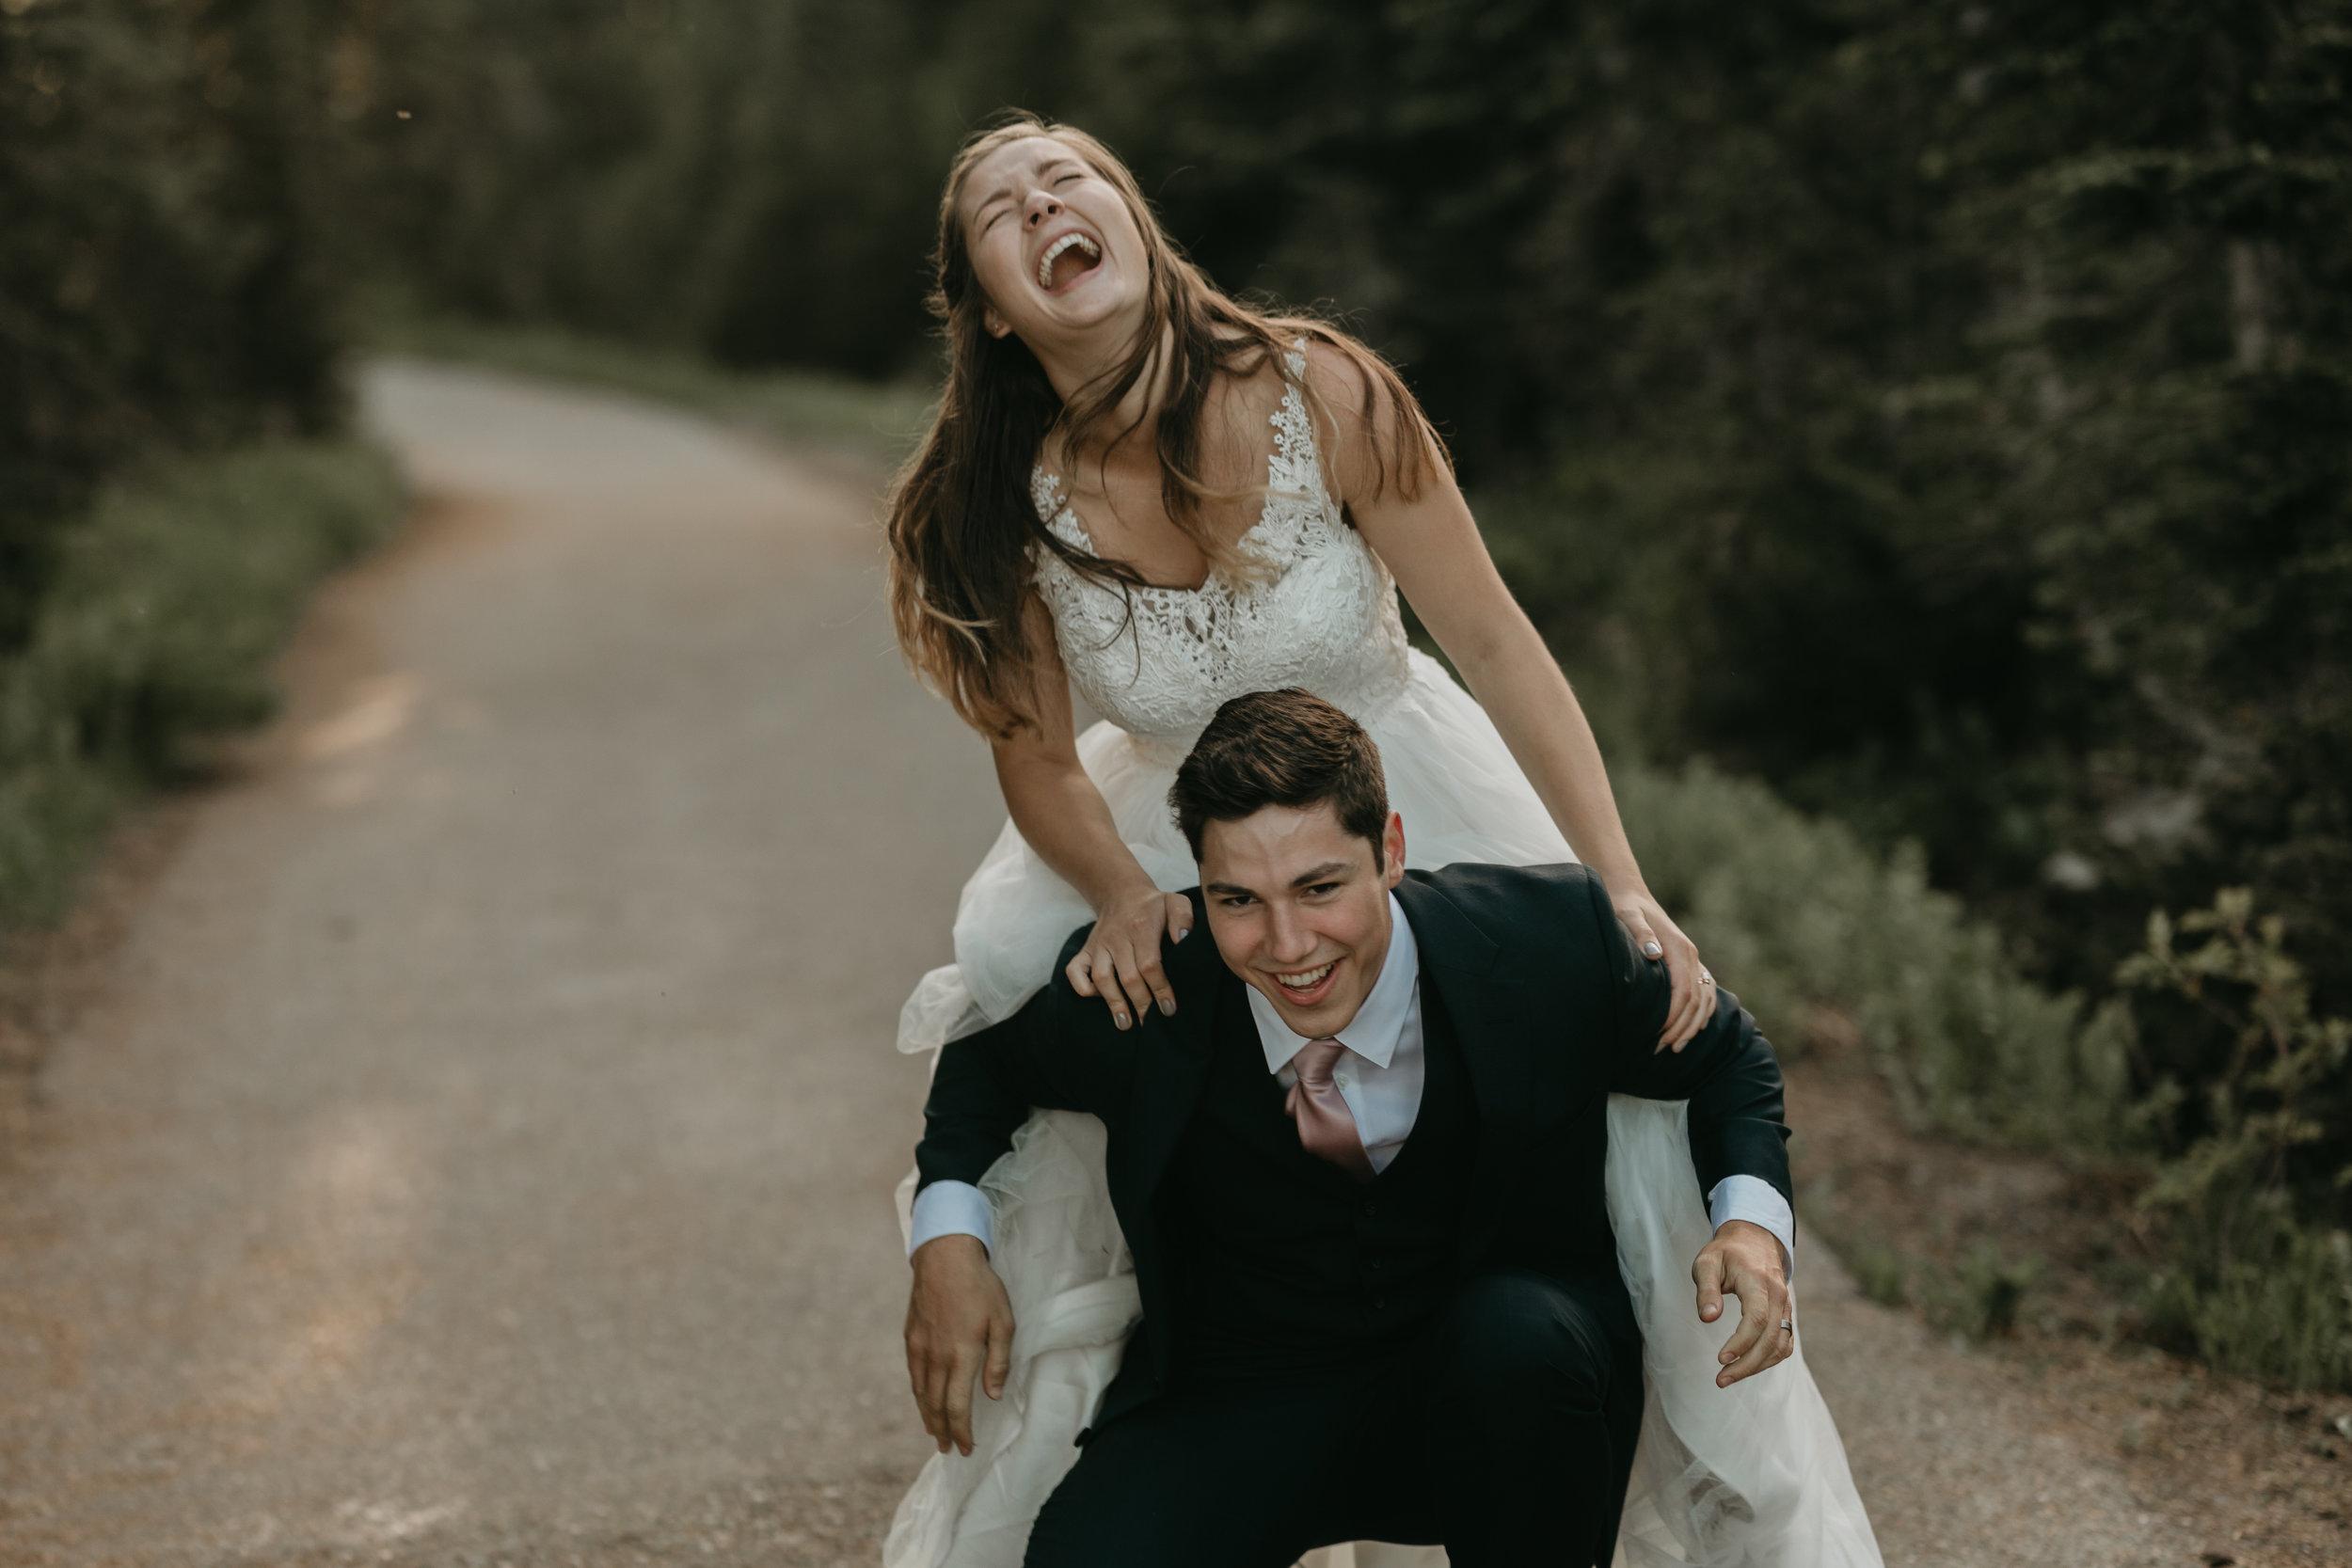 Nicole-Daacke-Photography-Mt-Rainier-elopement-photographer-washington-mountain-epic-wedding-photography-wildflowers-at-rainier-pine-tree-cloudy-summer-day-at-mountain-rainier-29.jpg